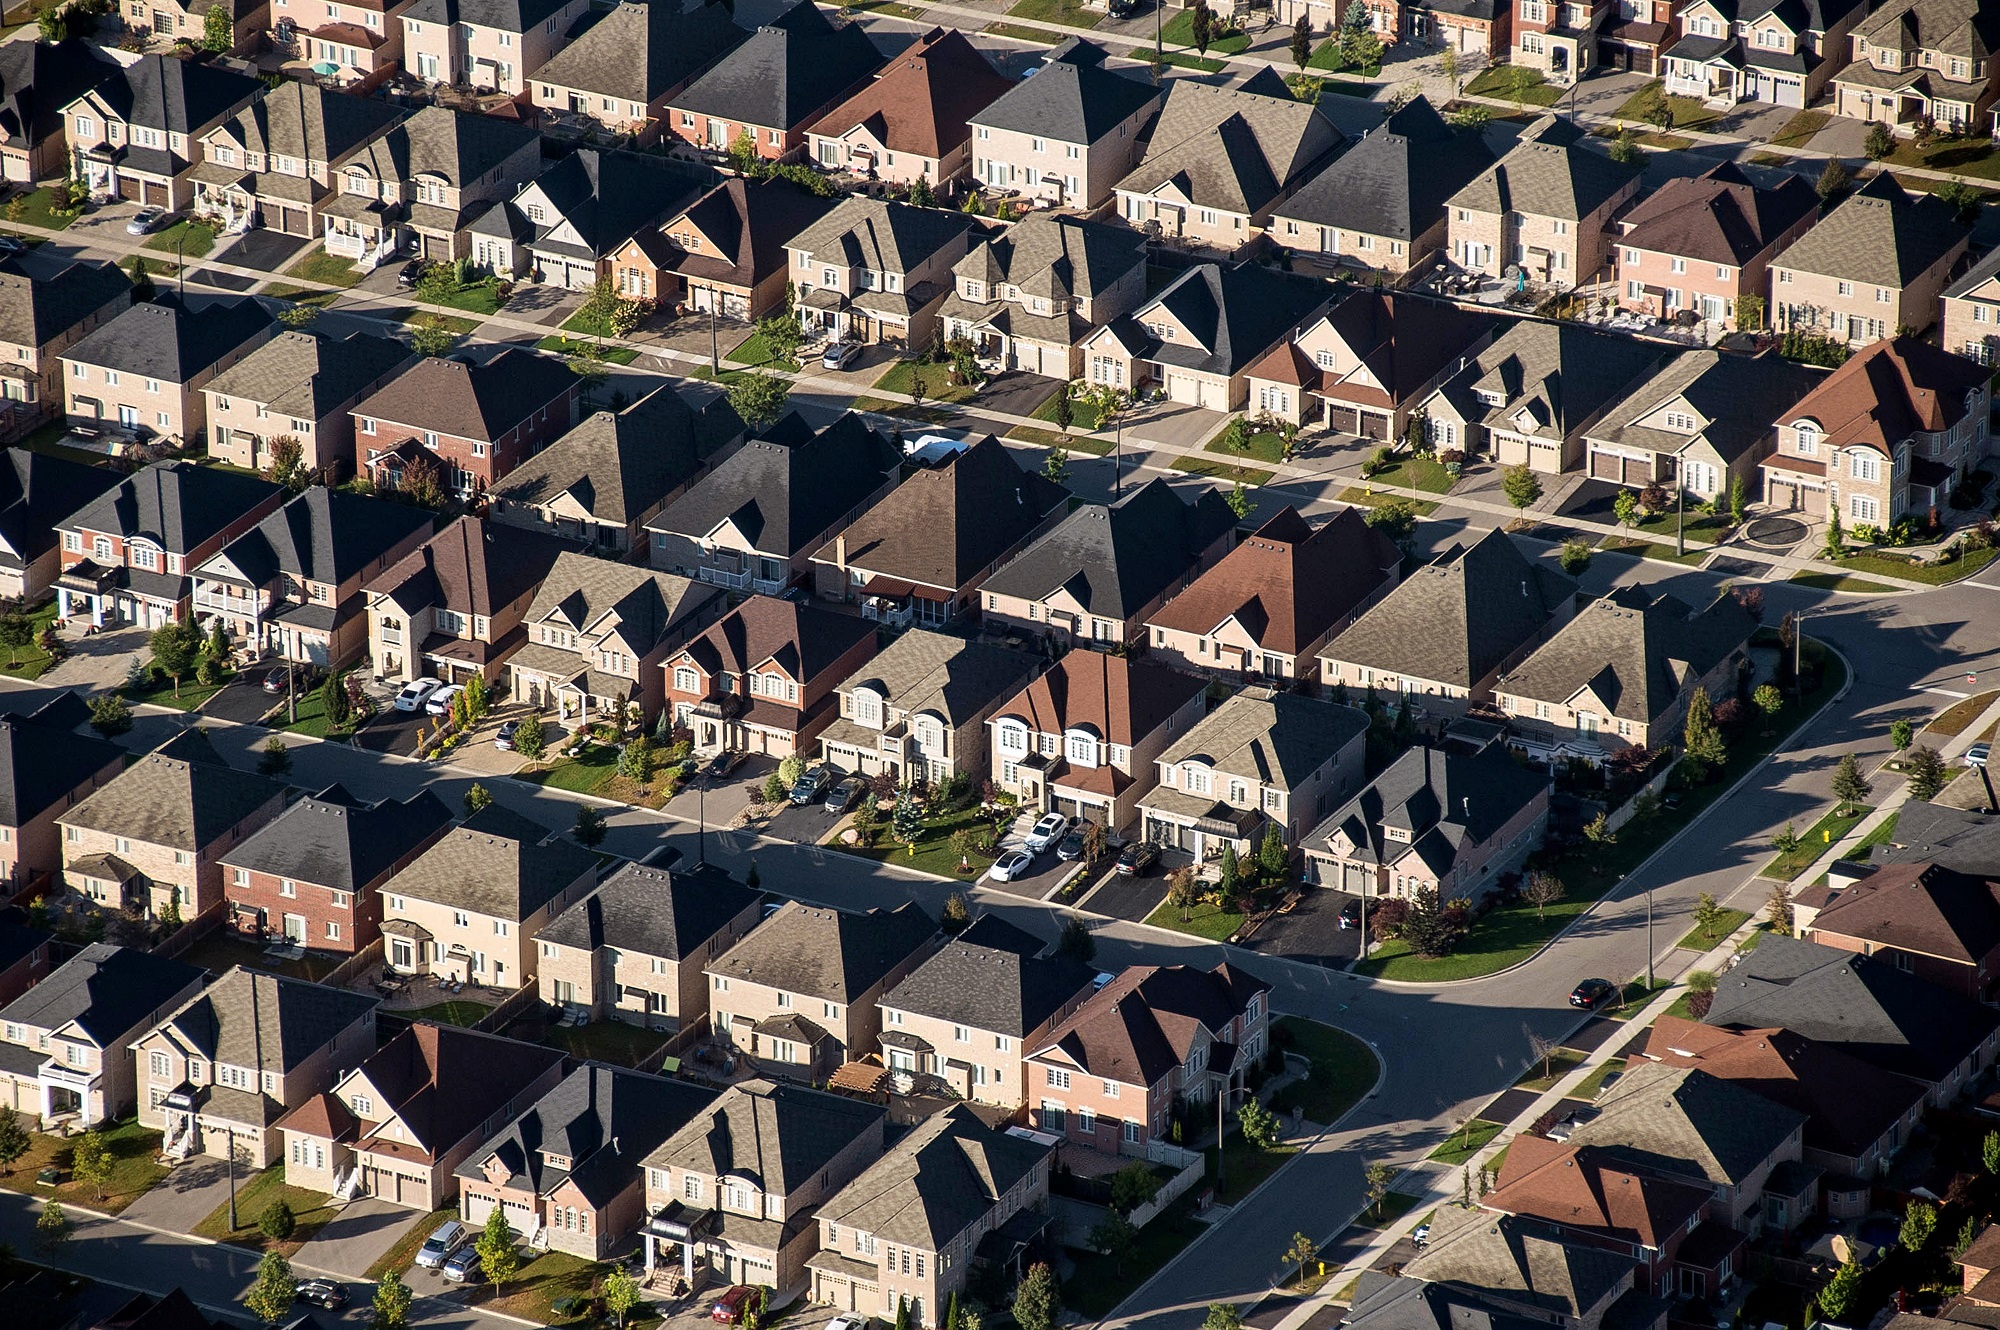 nations housing market - 1000×750